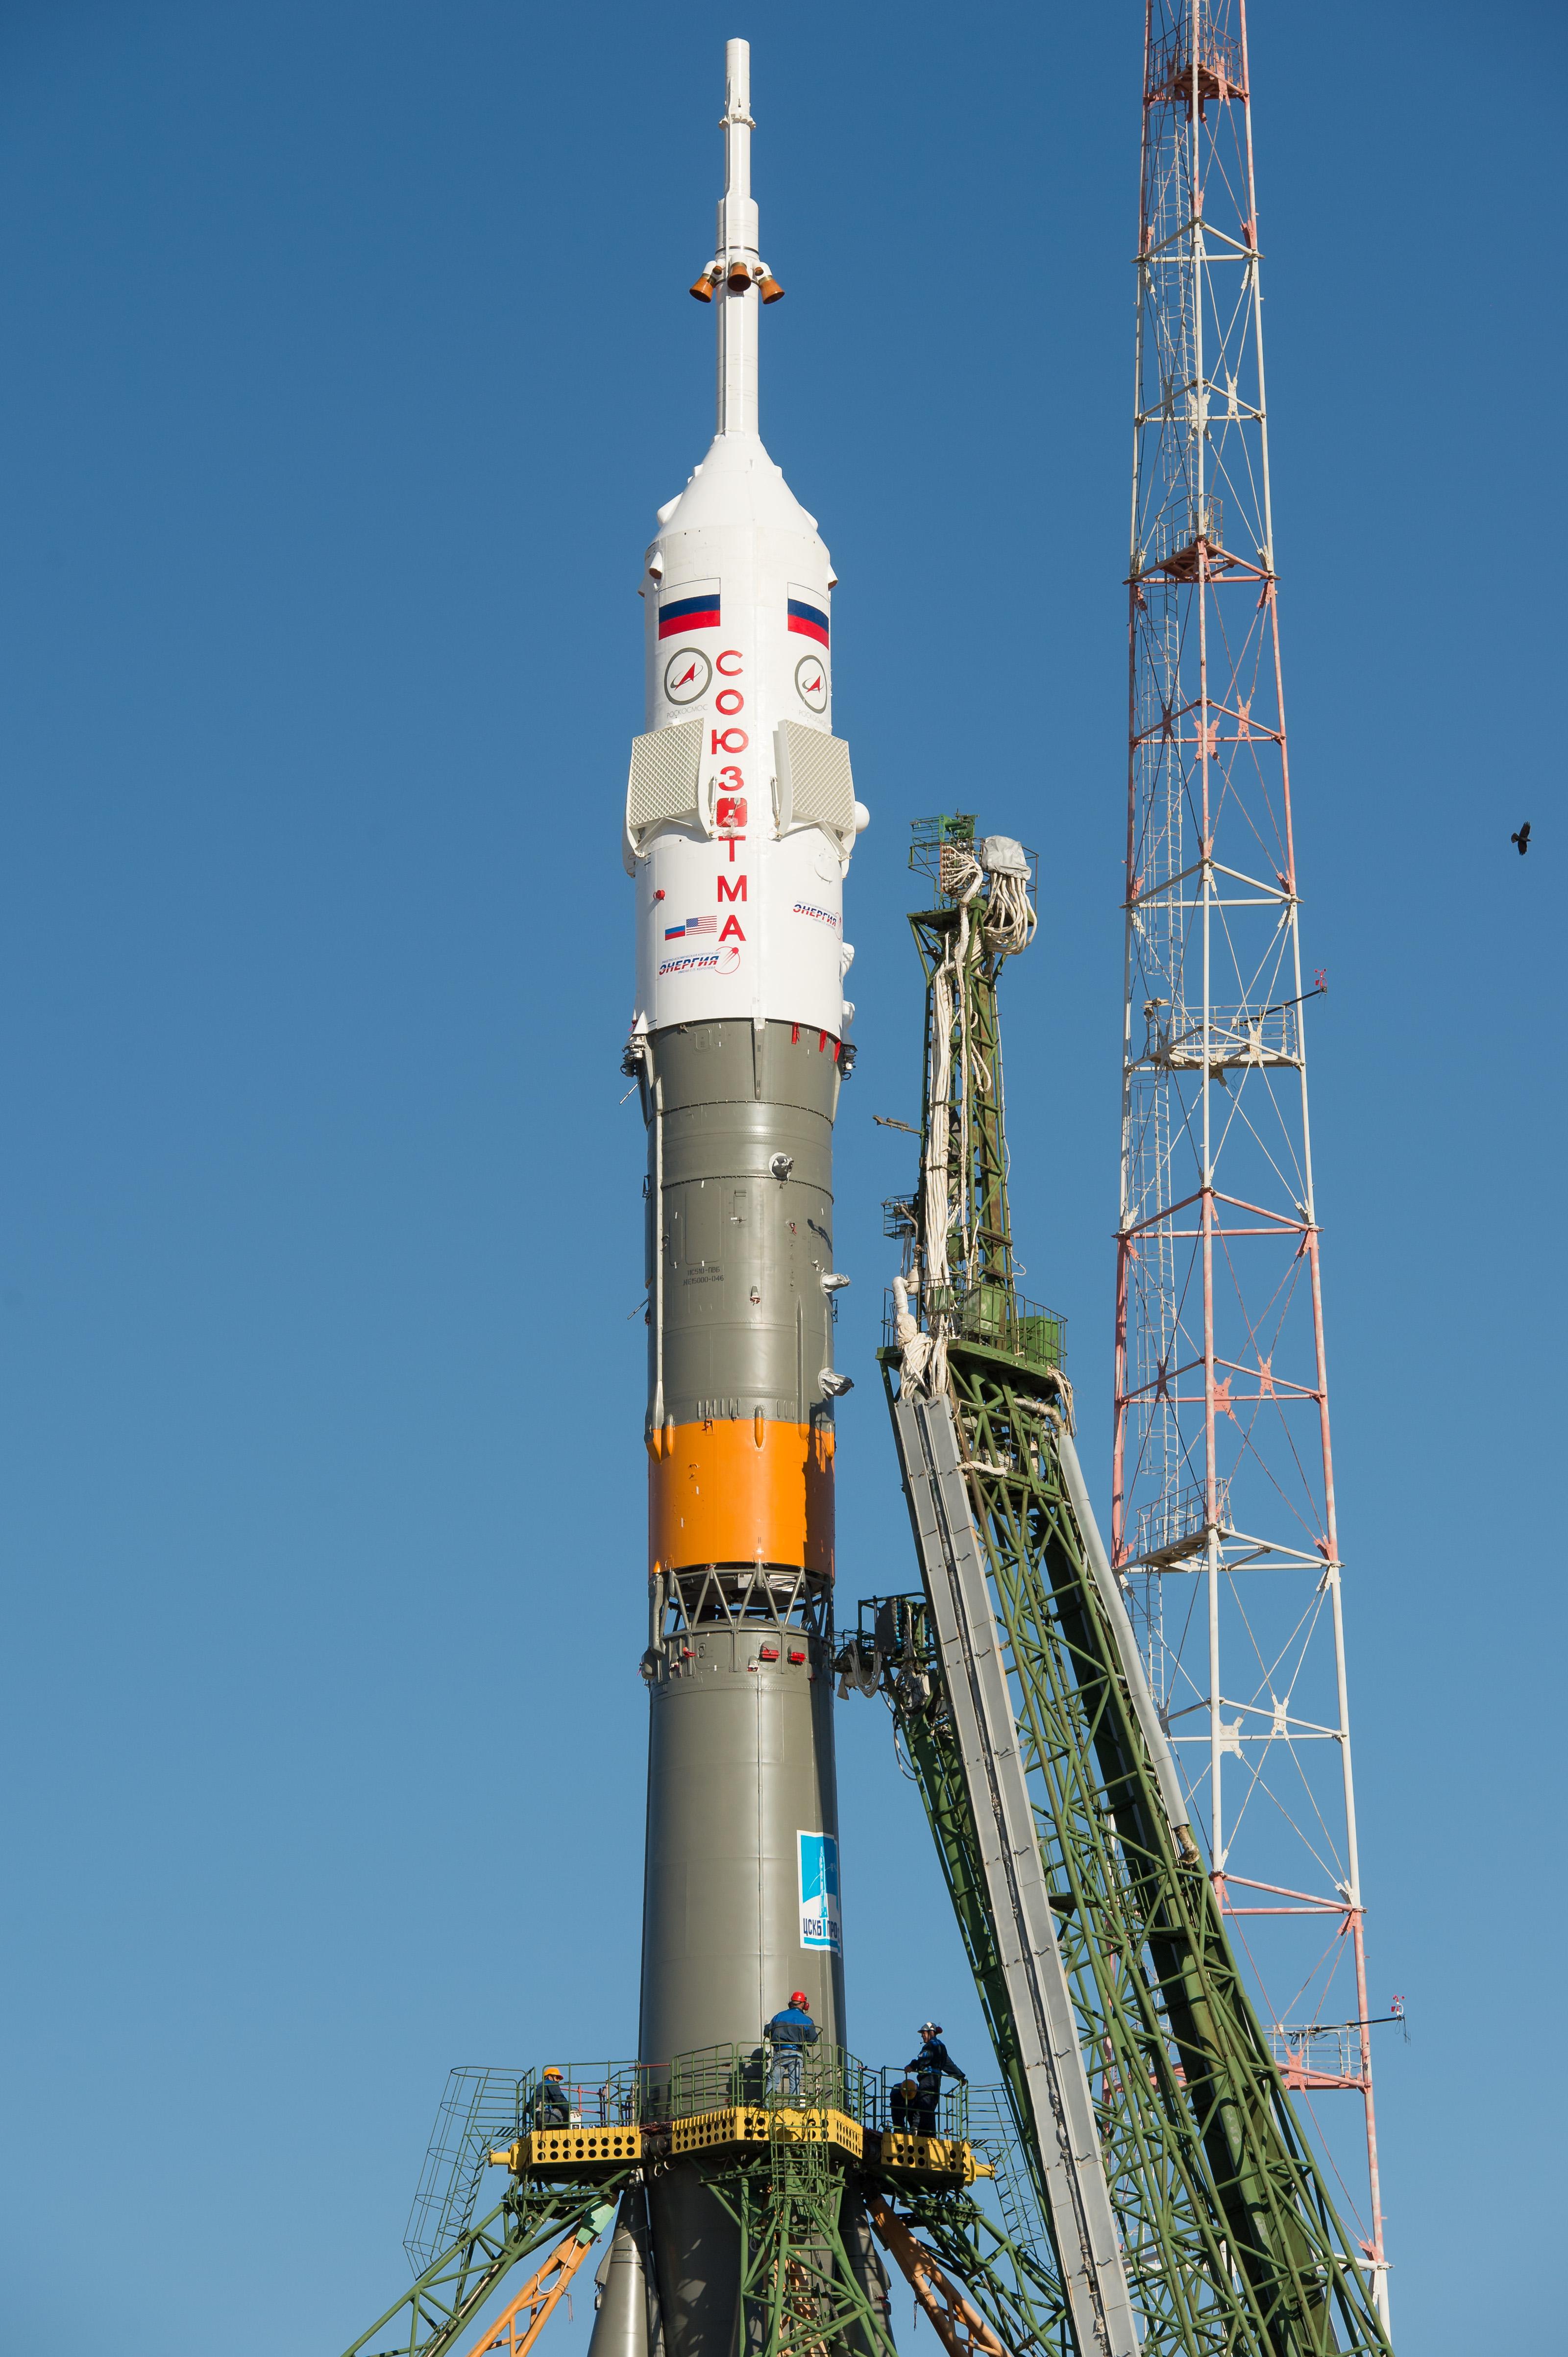 Expedition 37: Gantry Mechanisms Secure Soyuz Rocket